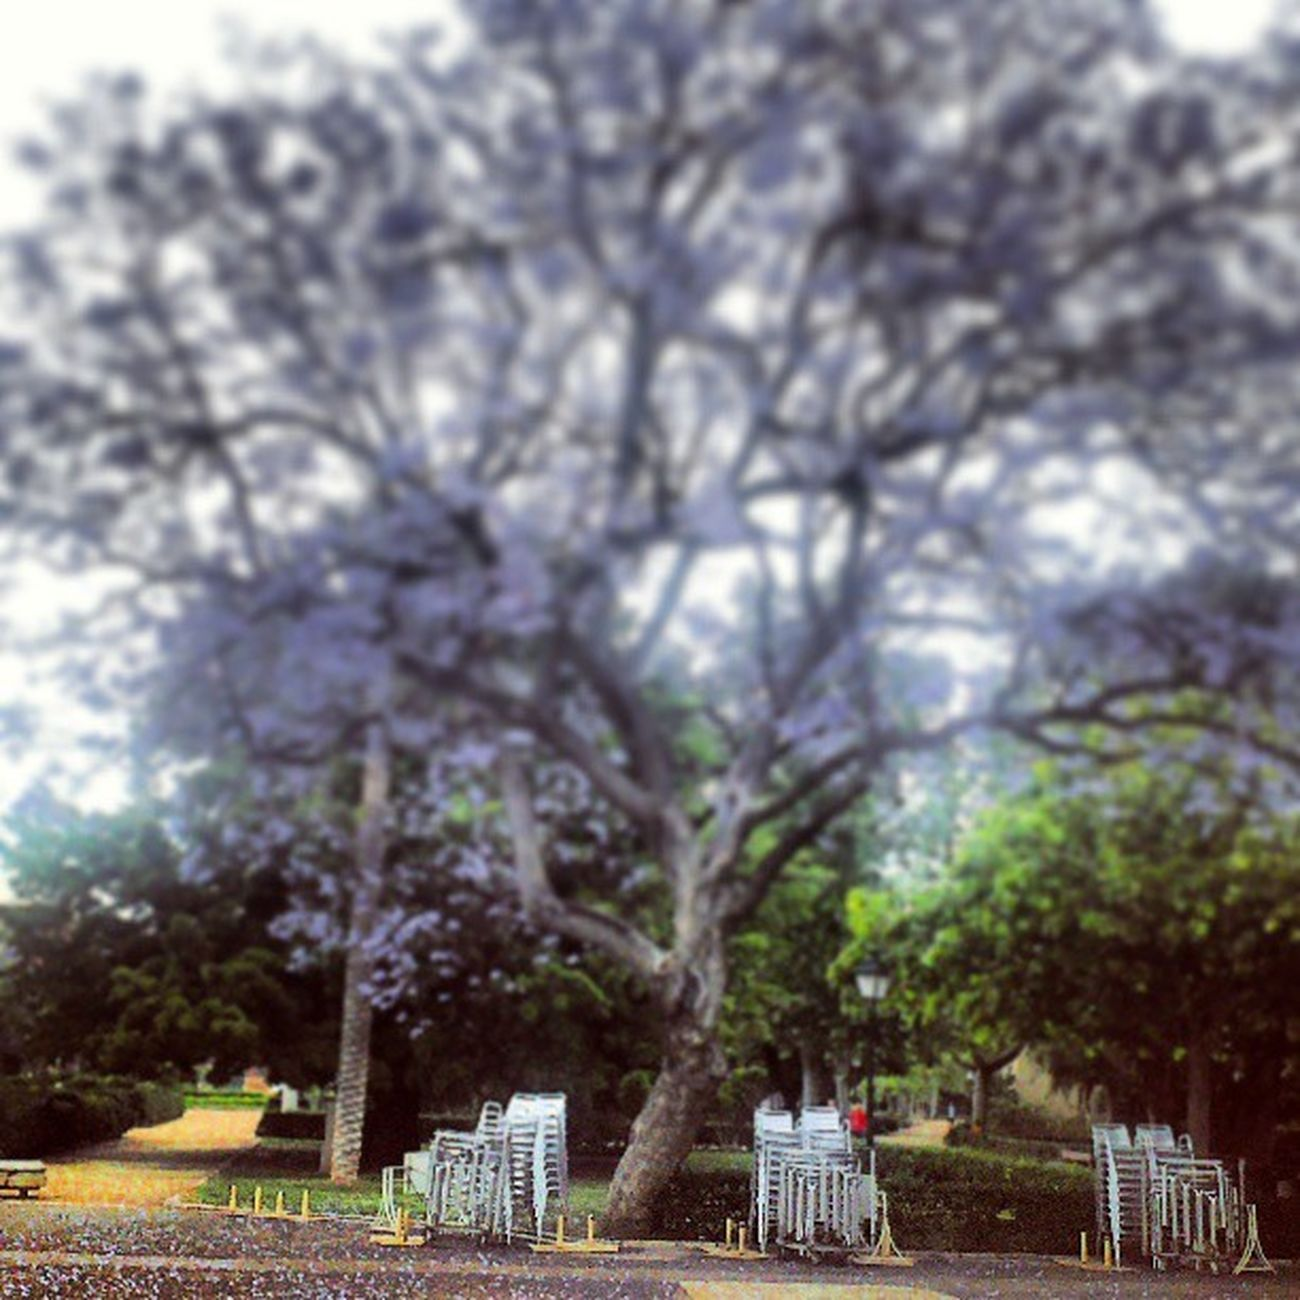 #valencia #jardinesdelreal #viveros #garden #spain Garden València SPAIN Viveros Jardinesdelreal